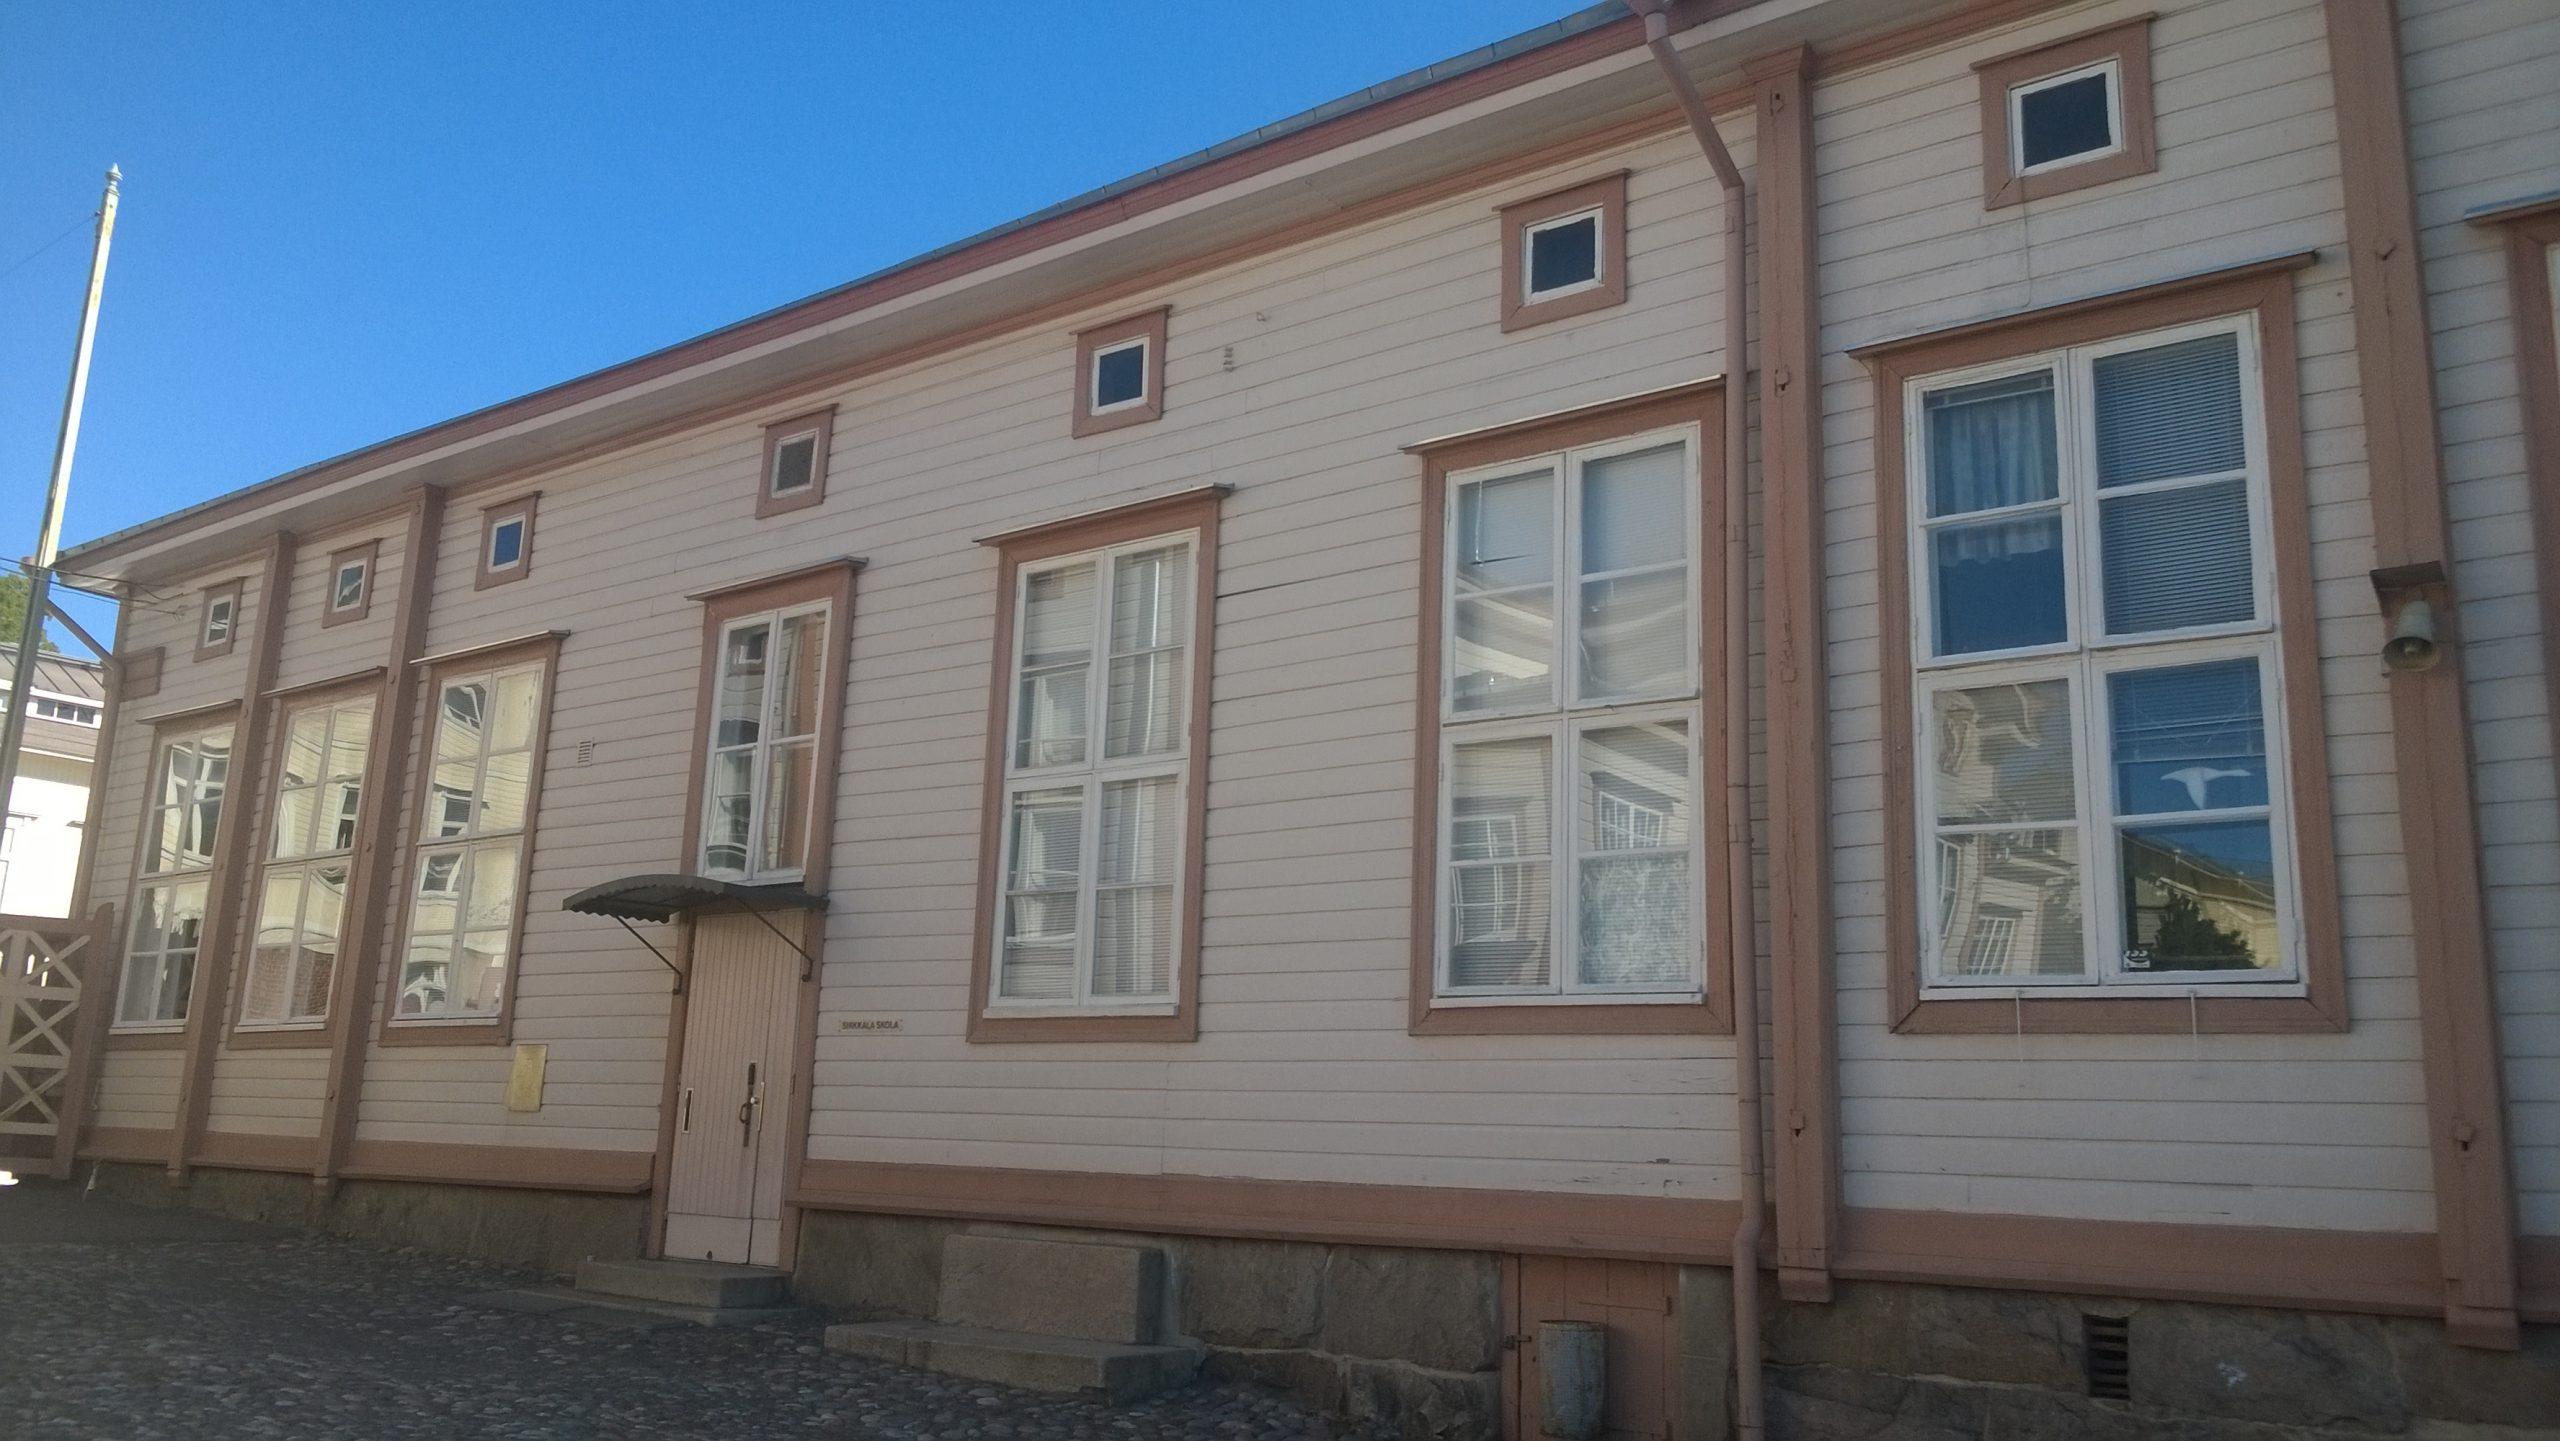 Sirkkala skola, Åbo